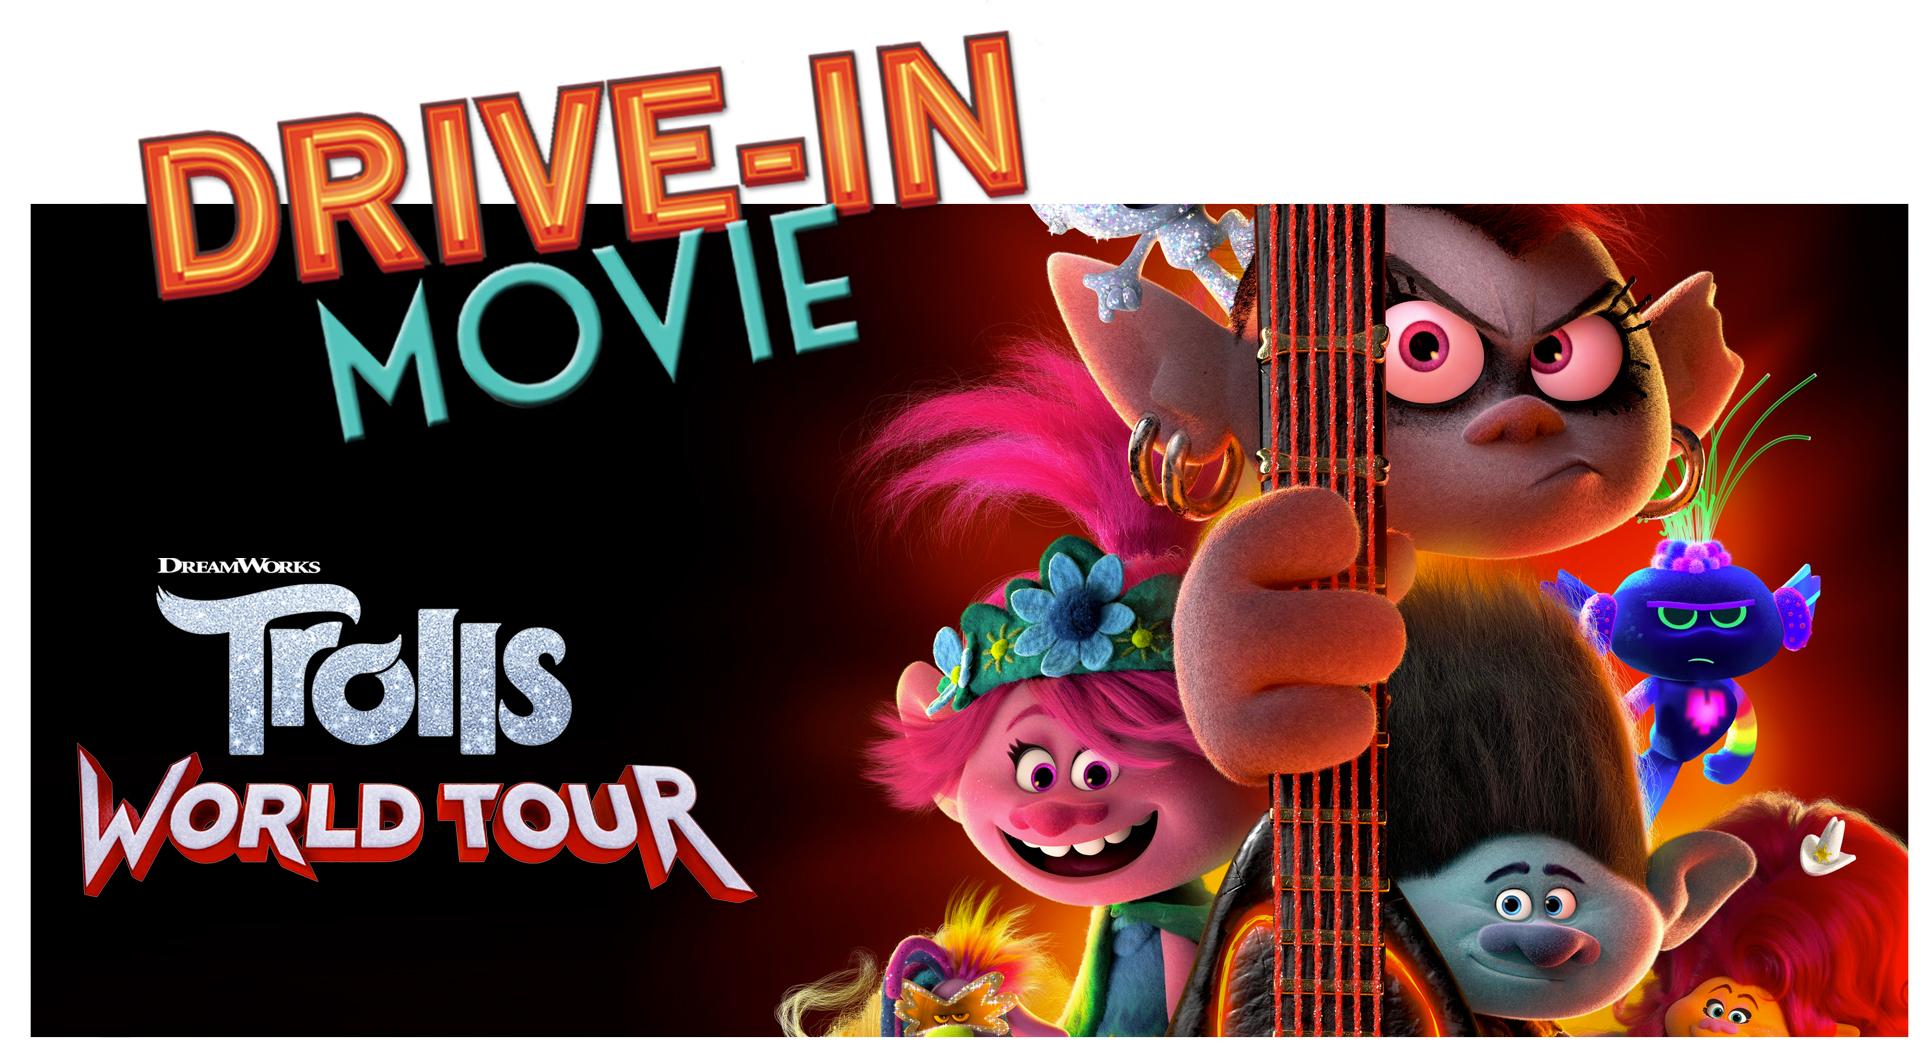 Drive-In Movie - TROLLS WORLD TOUR